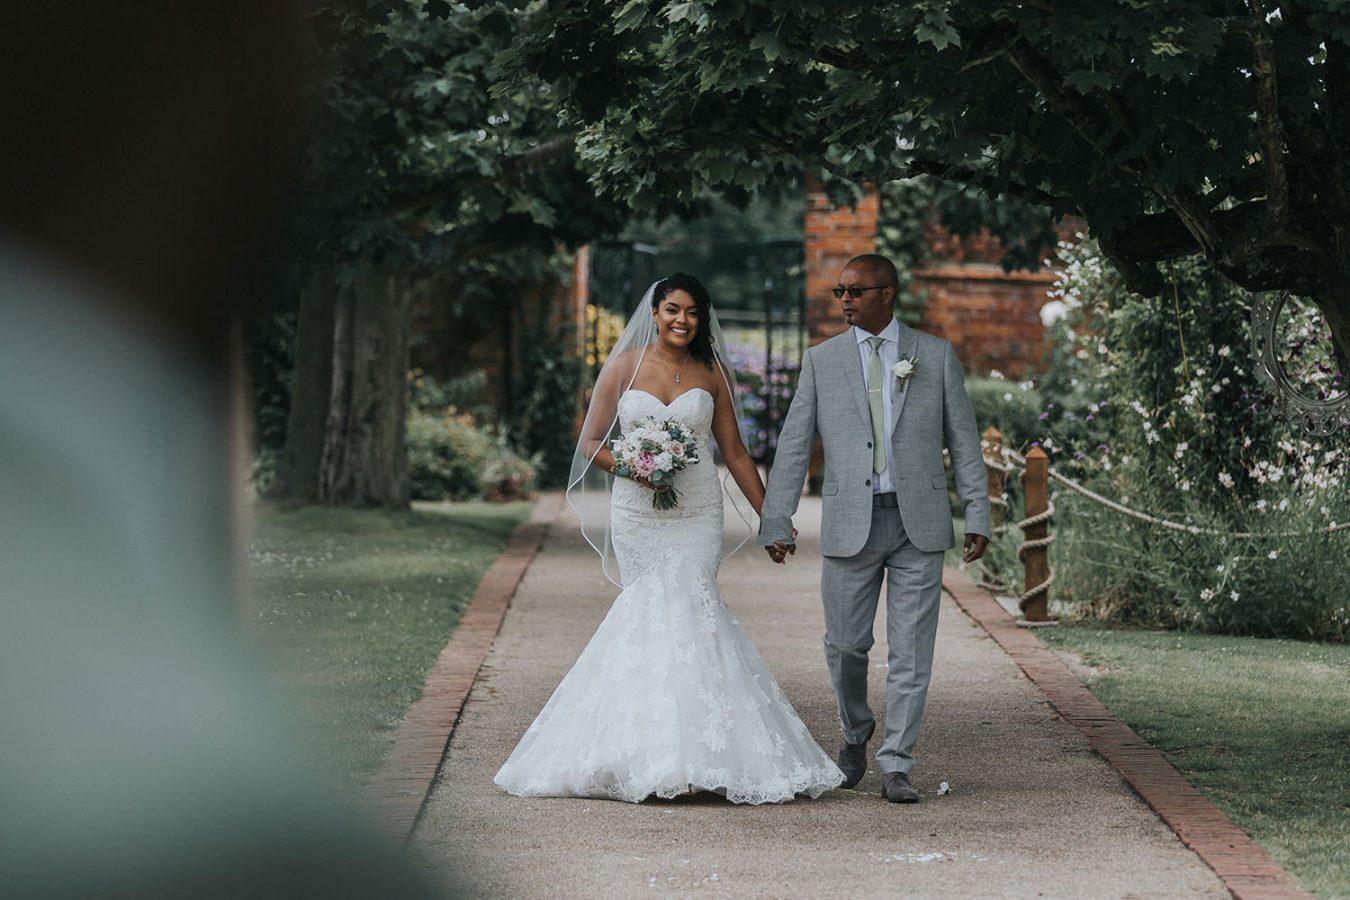 gaynes-park-wedding-essex047